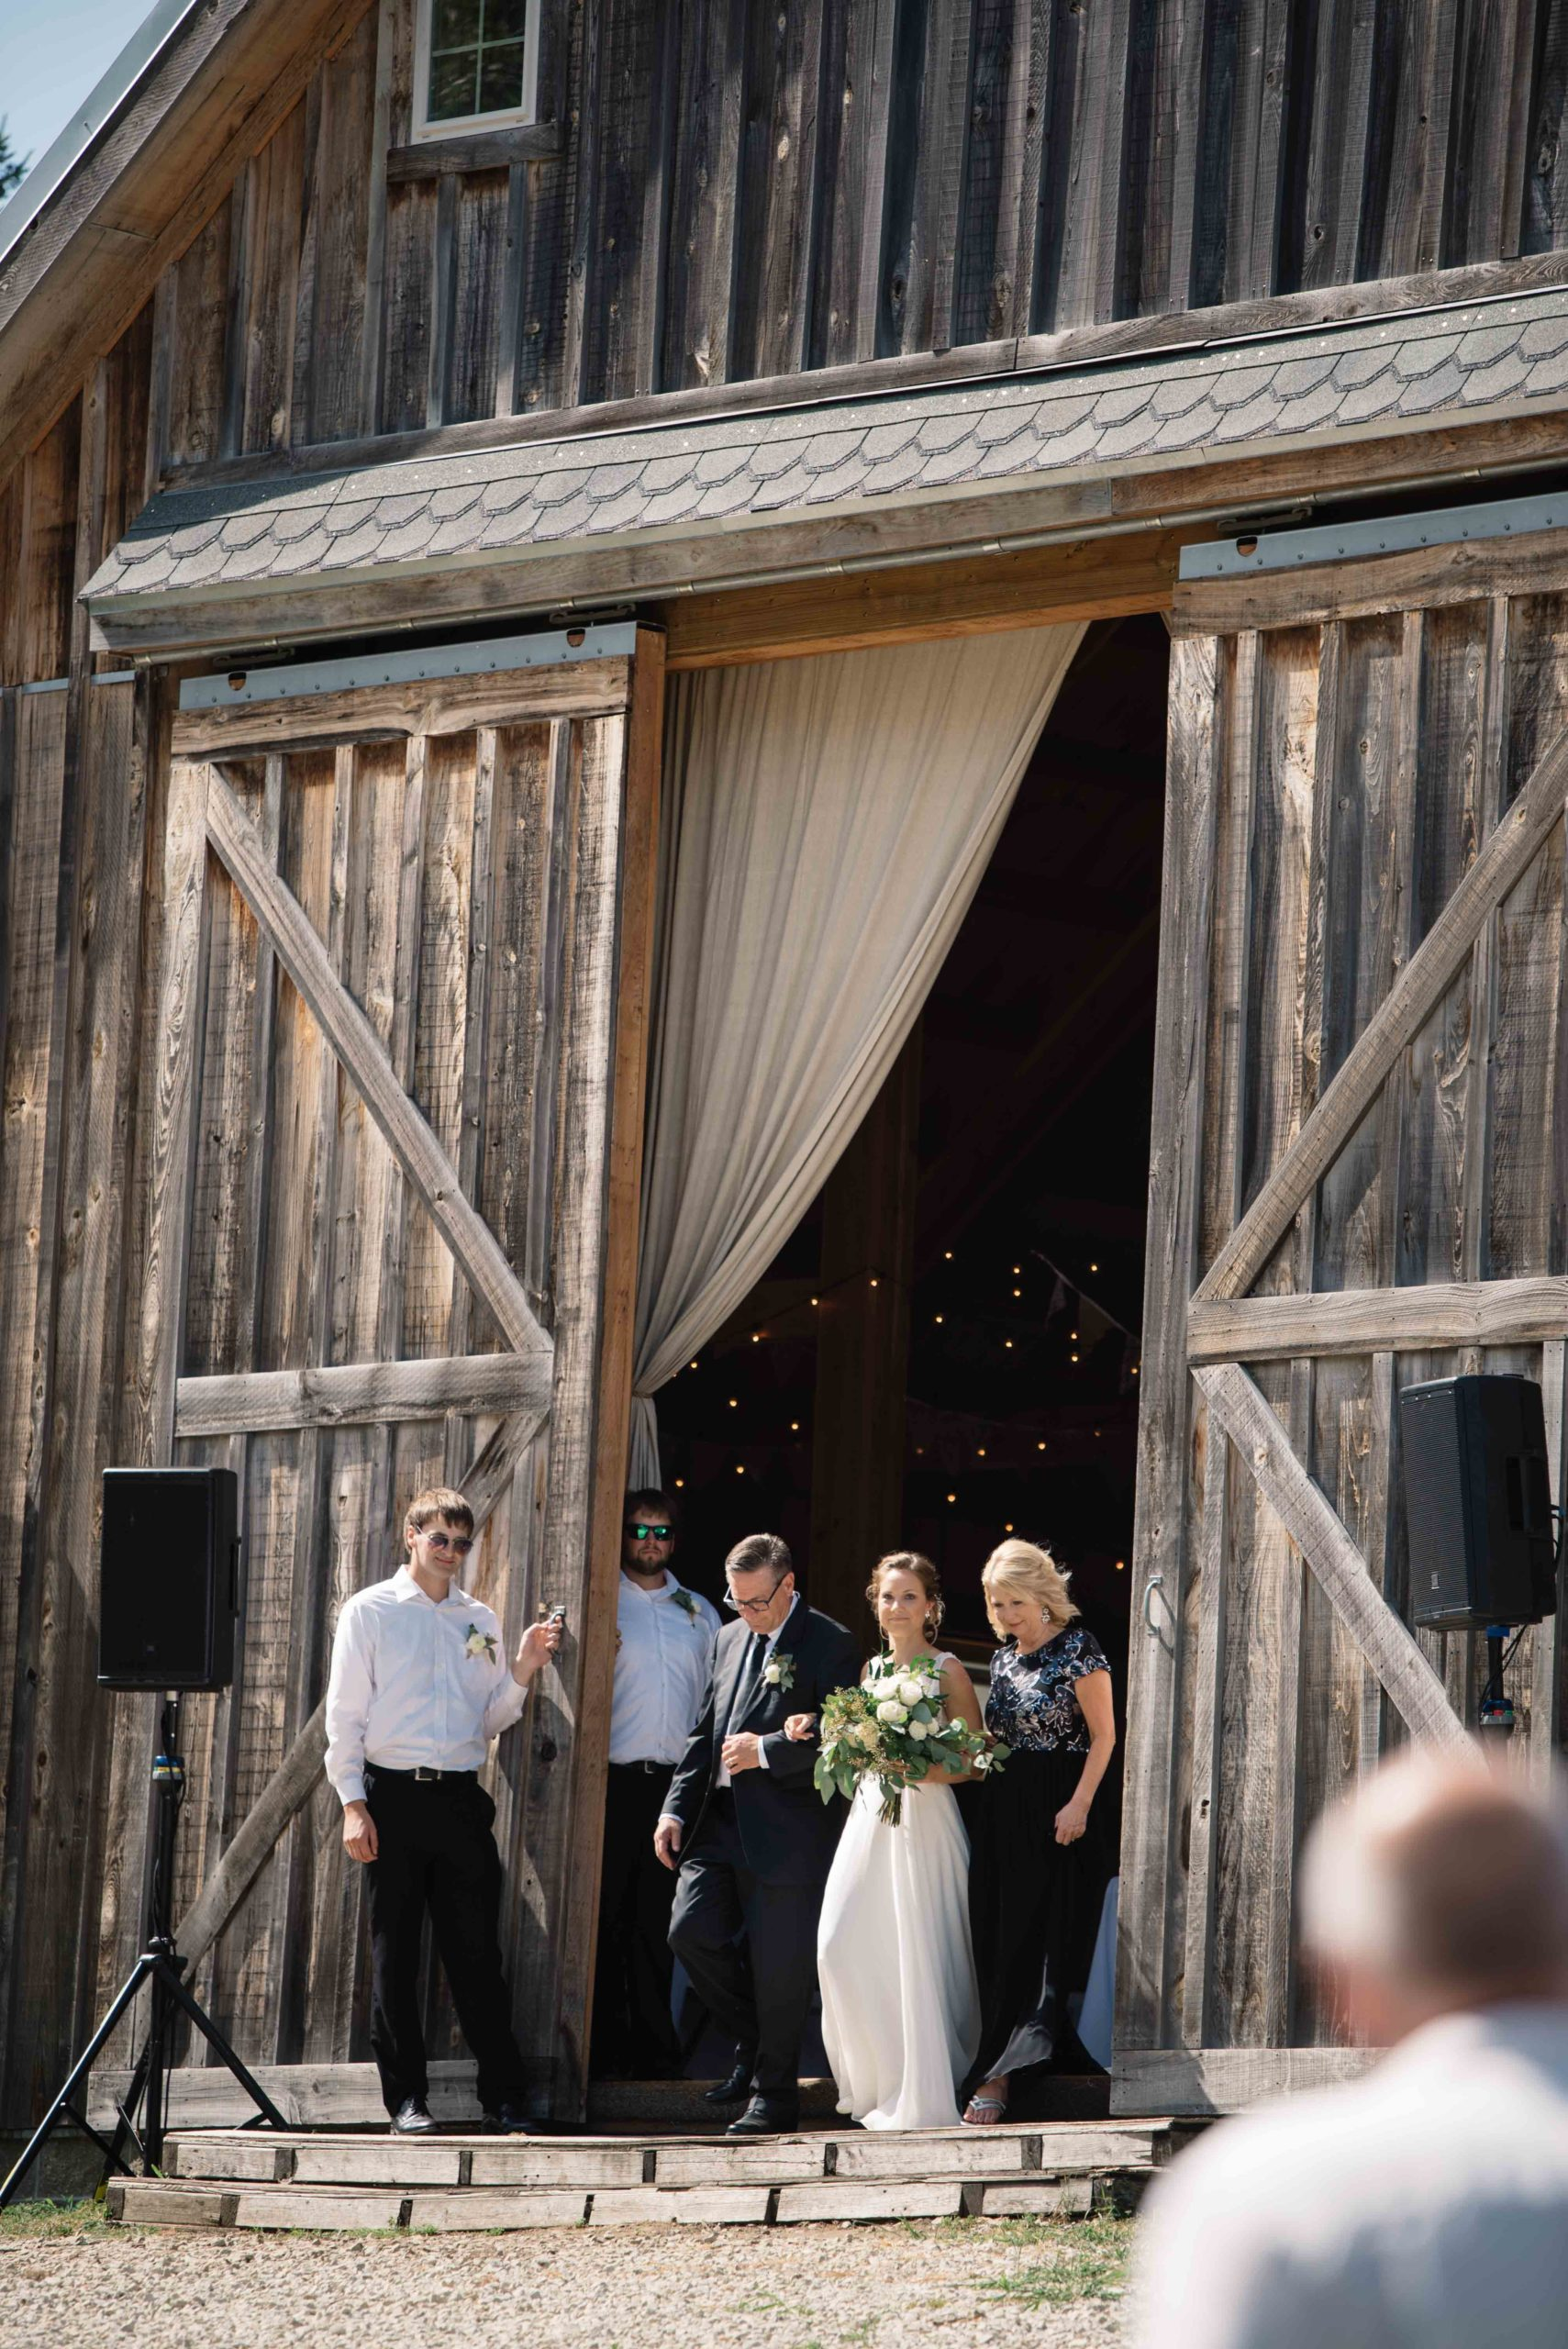 barn doors opening to reveal bride for outdoor Iowa barn wedding ceremony